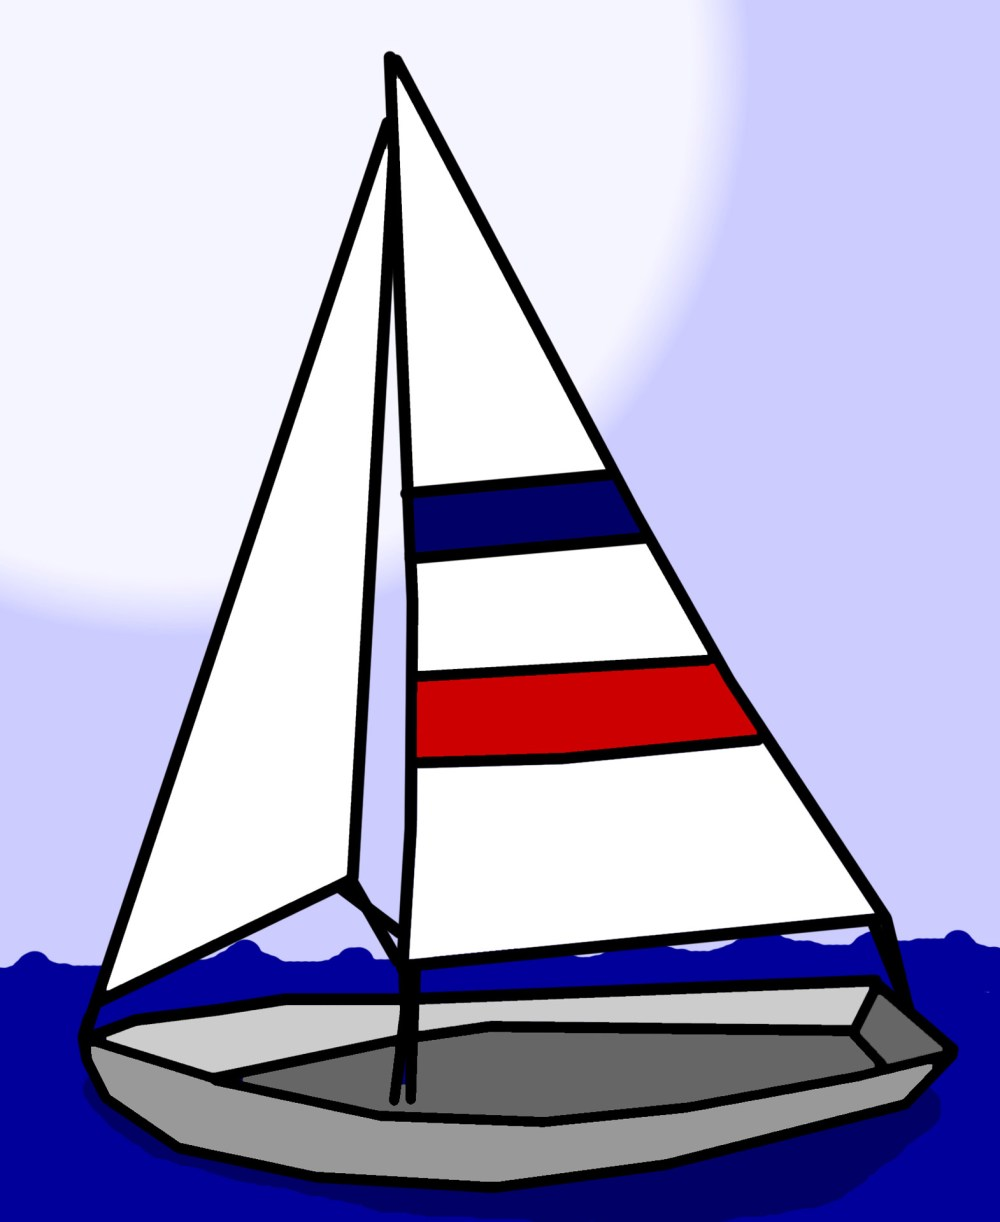 medium resolution of sailboat clip art free stock photo